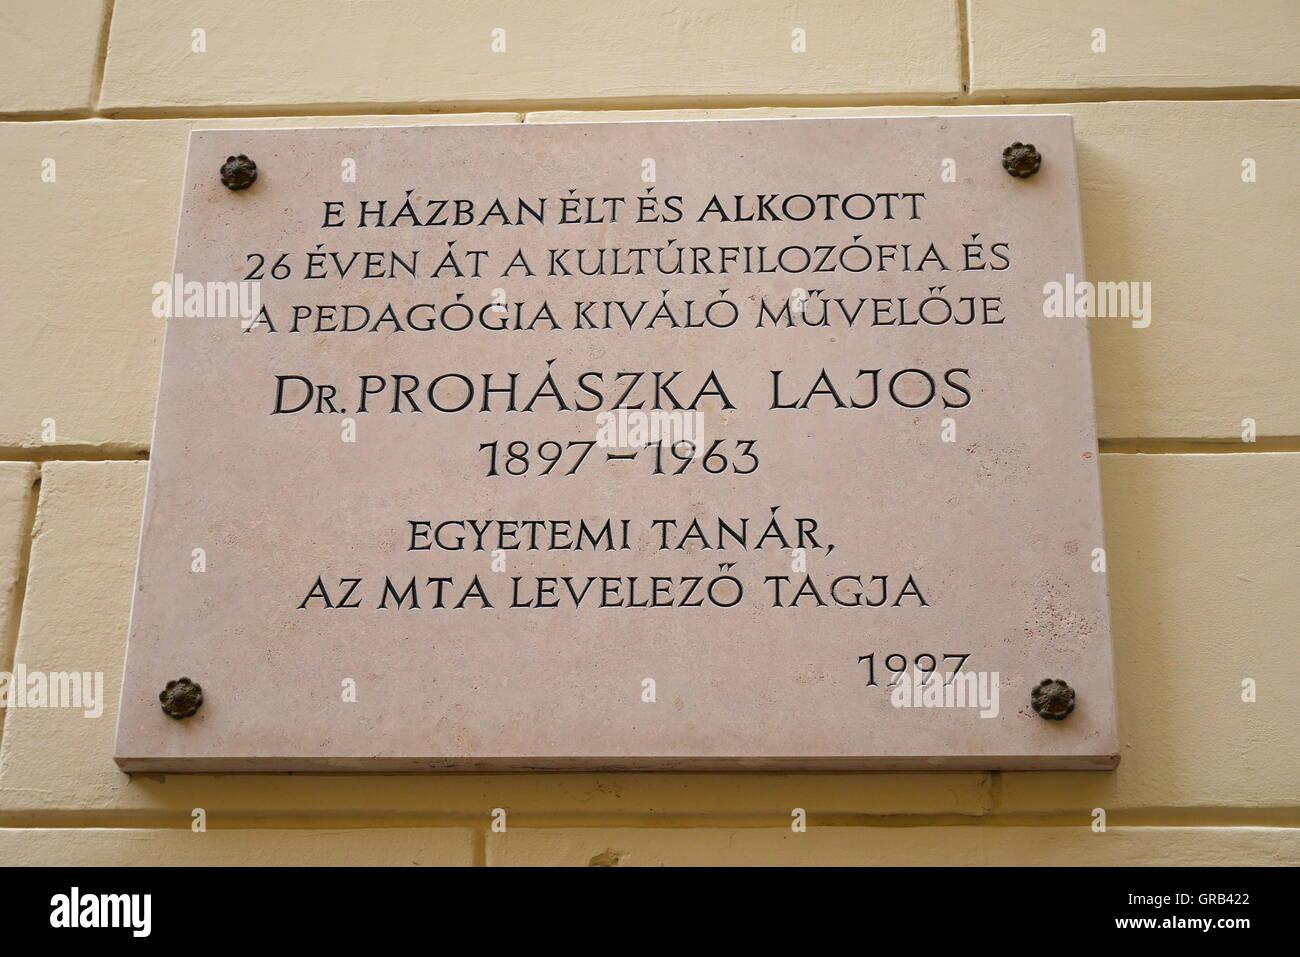 Commemorative plaque to university  professor Dr Lajos Prohaszka, Castle District, Budapest, Hungary - Stock Image